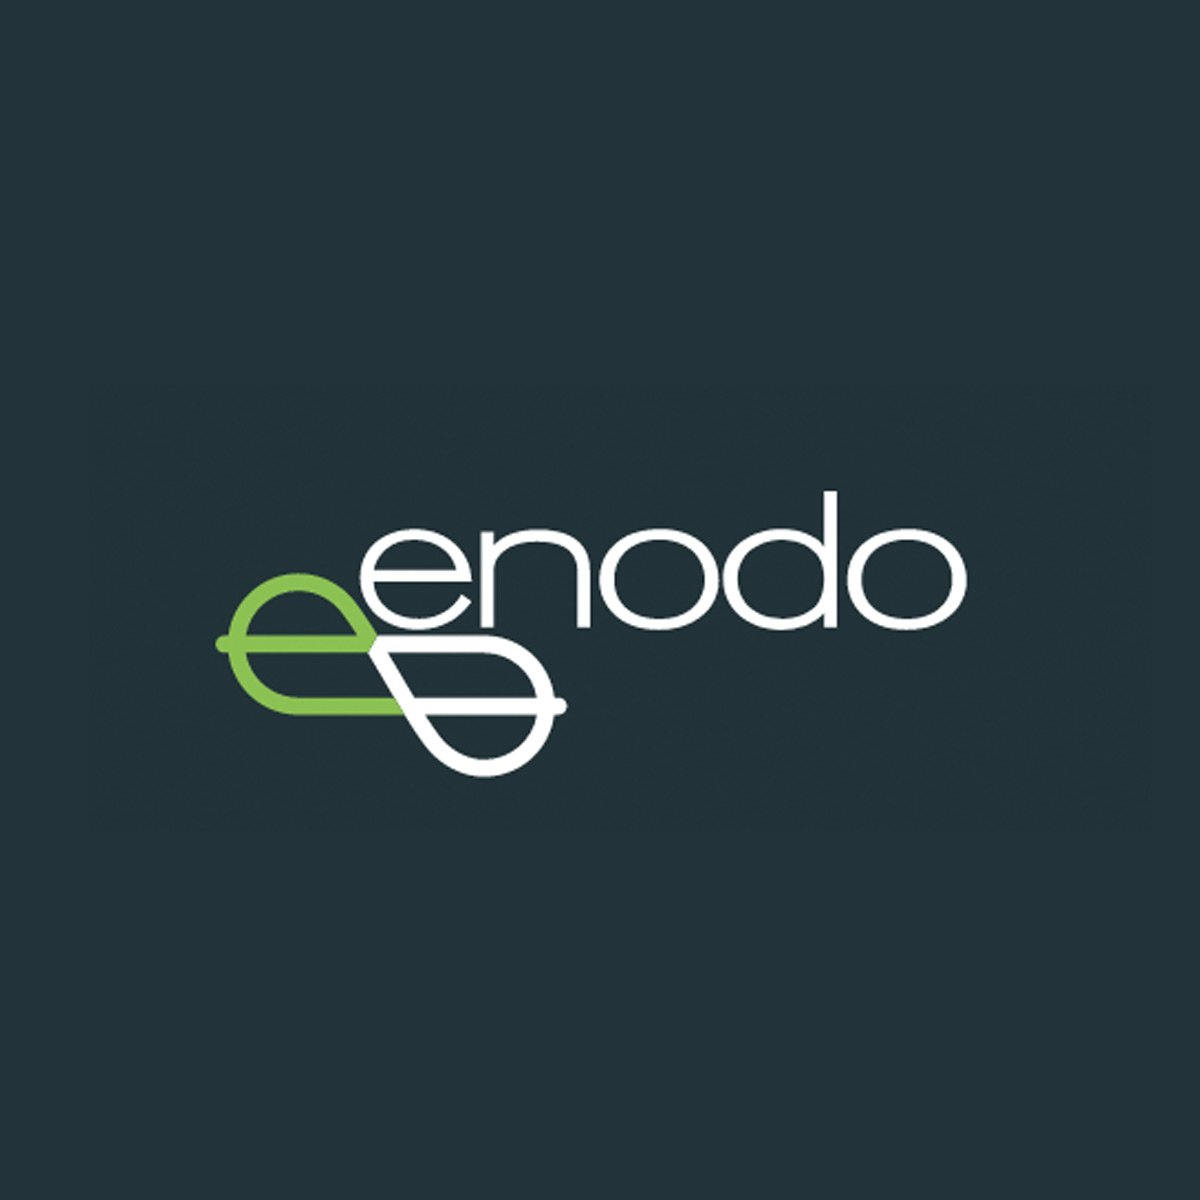 Enodo